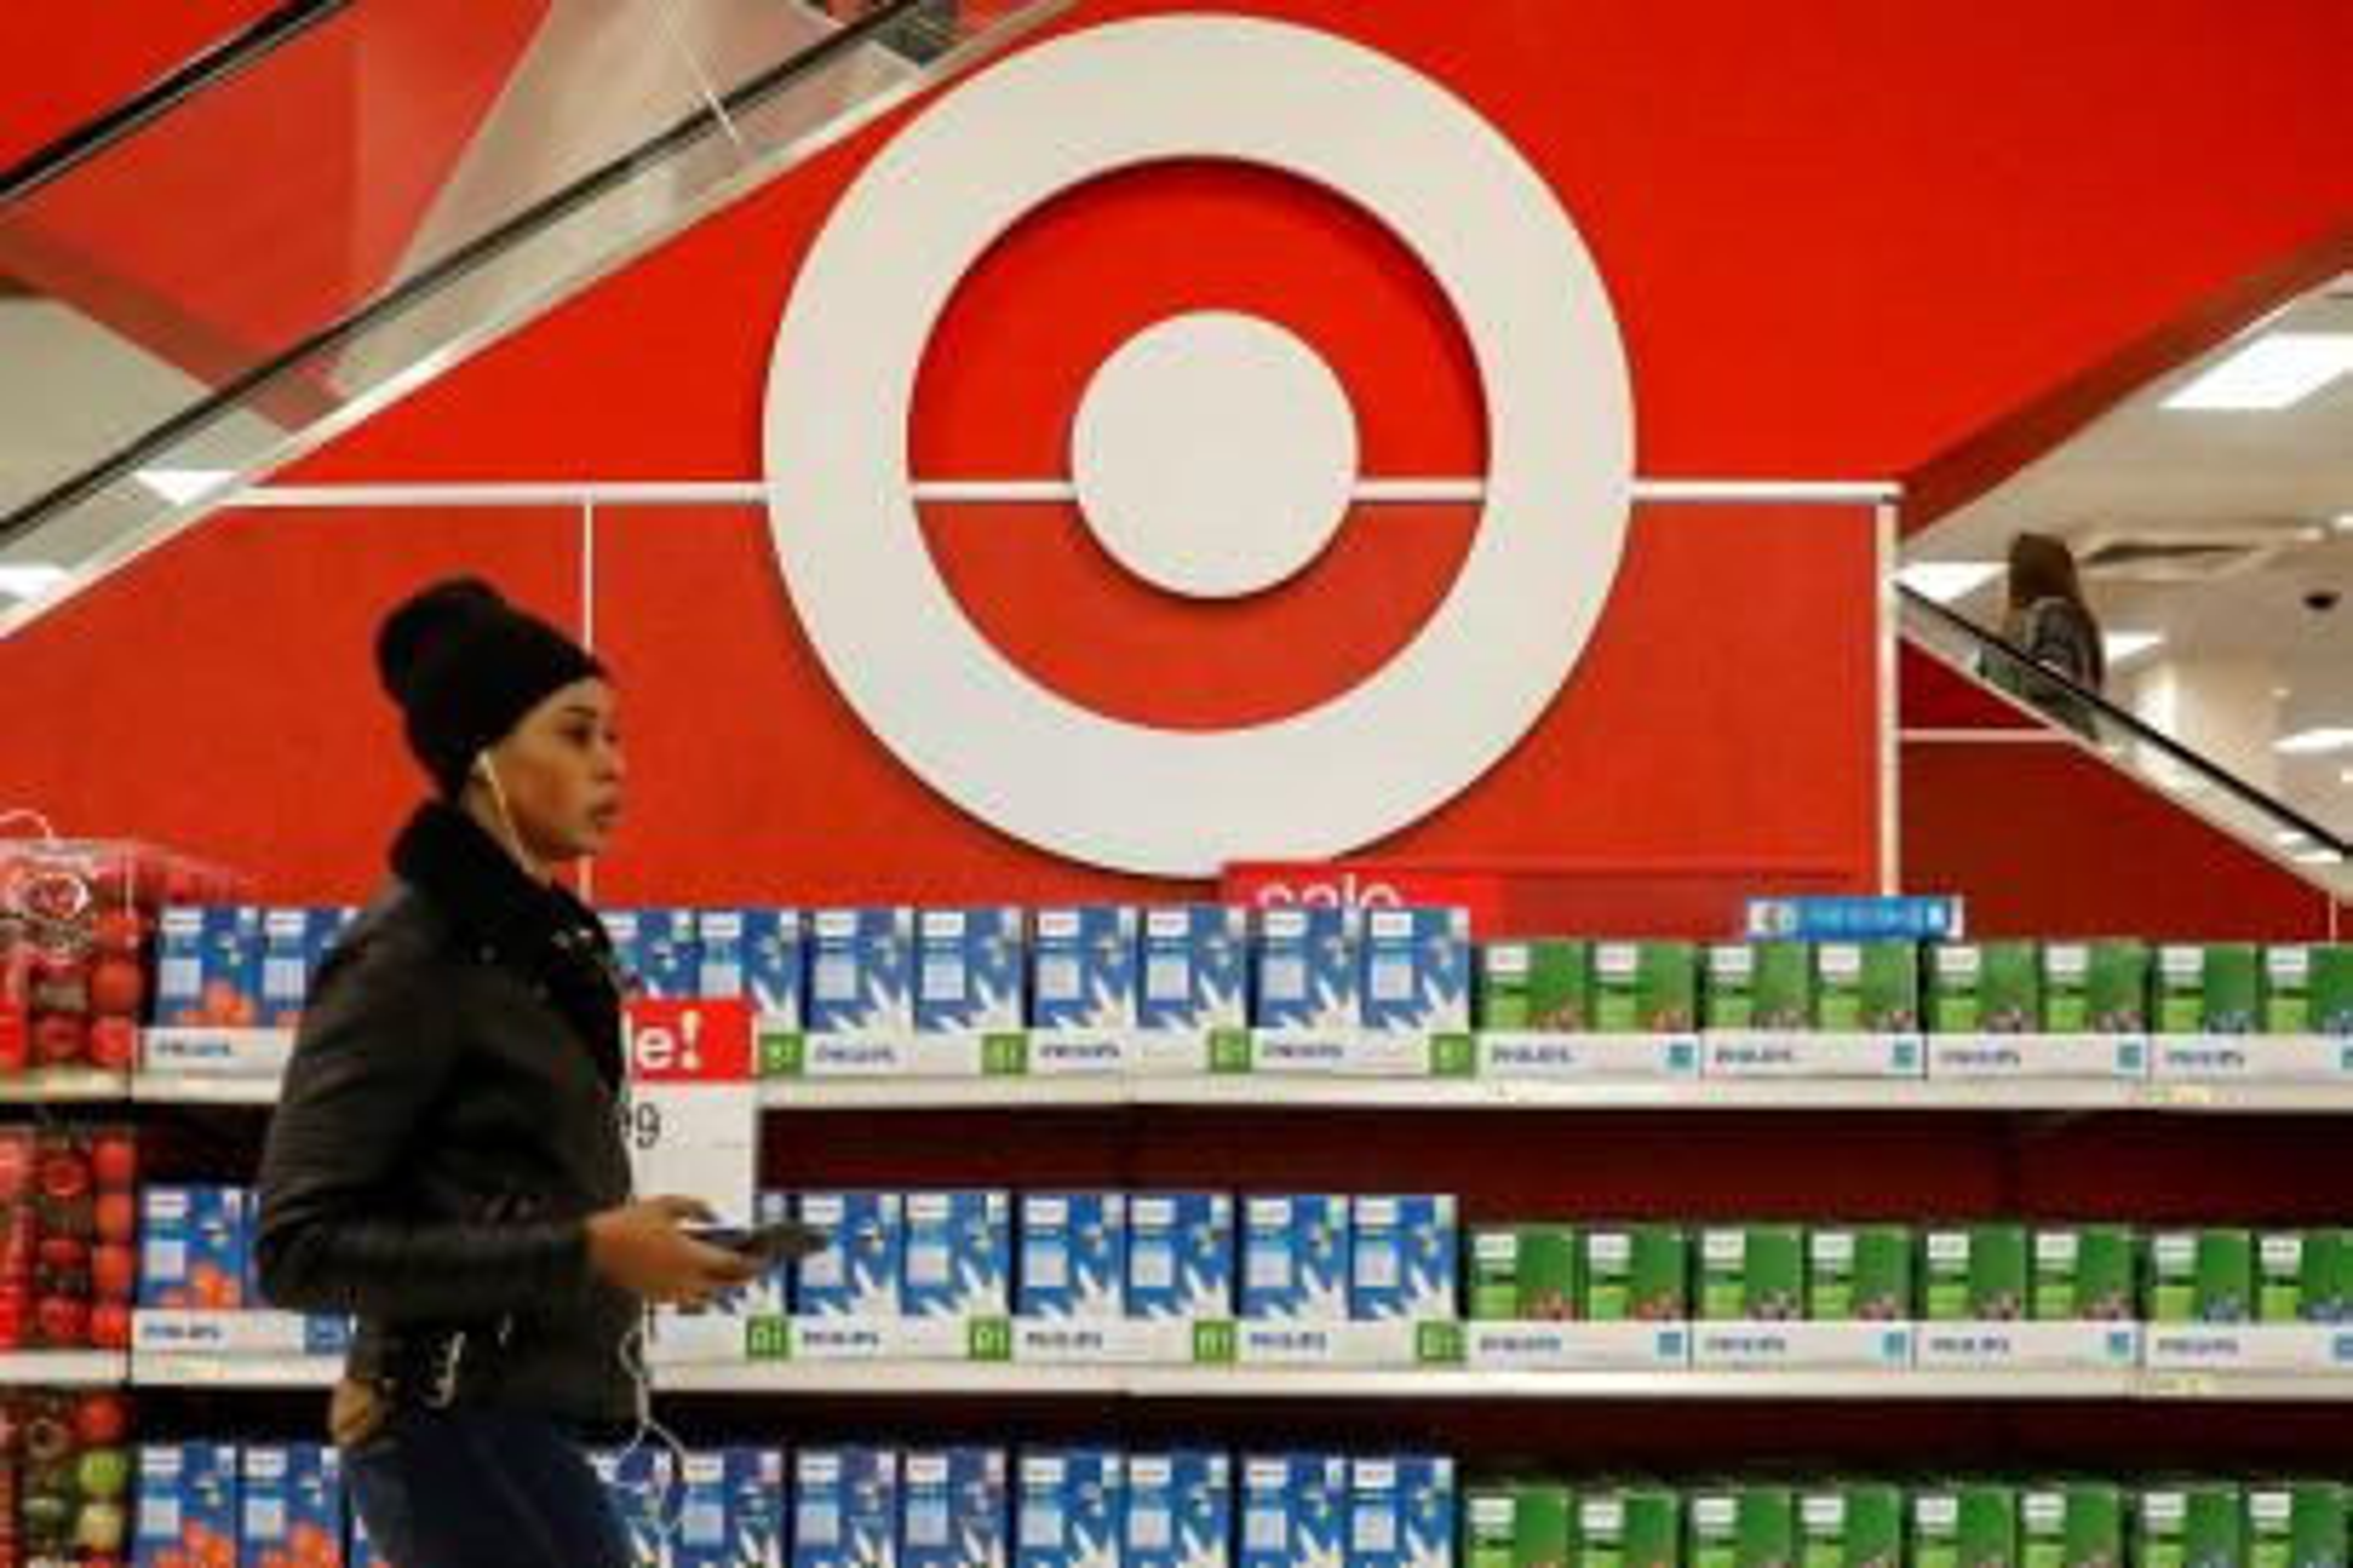 target bets private label brands will help it survive amazon quartz